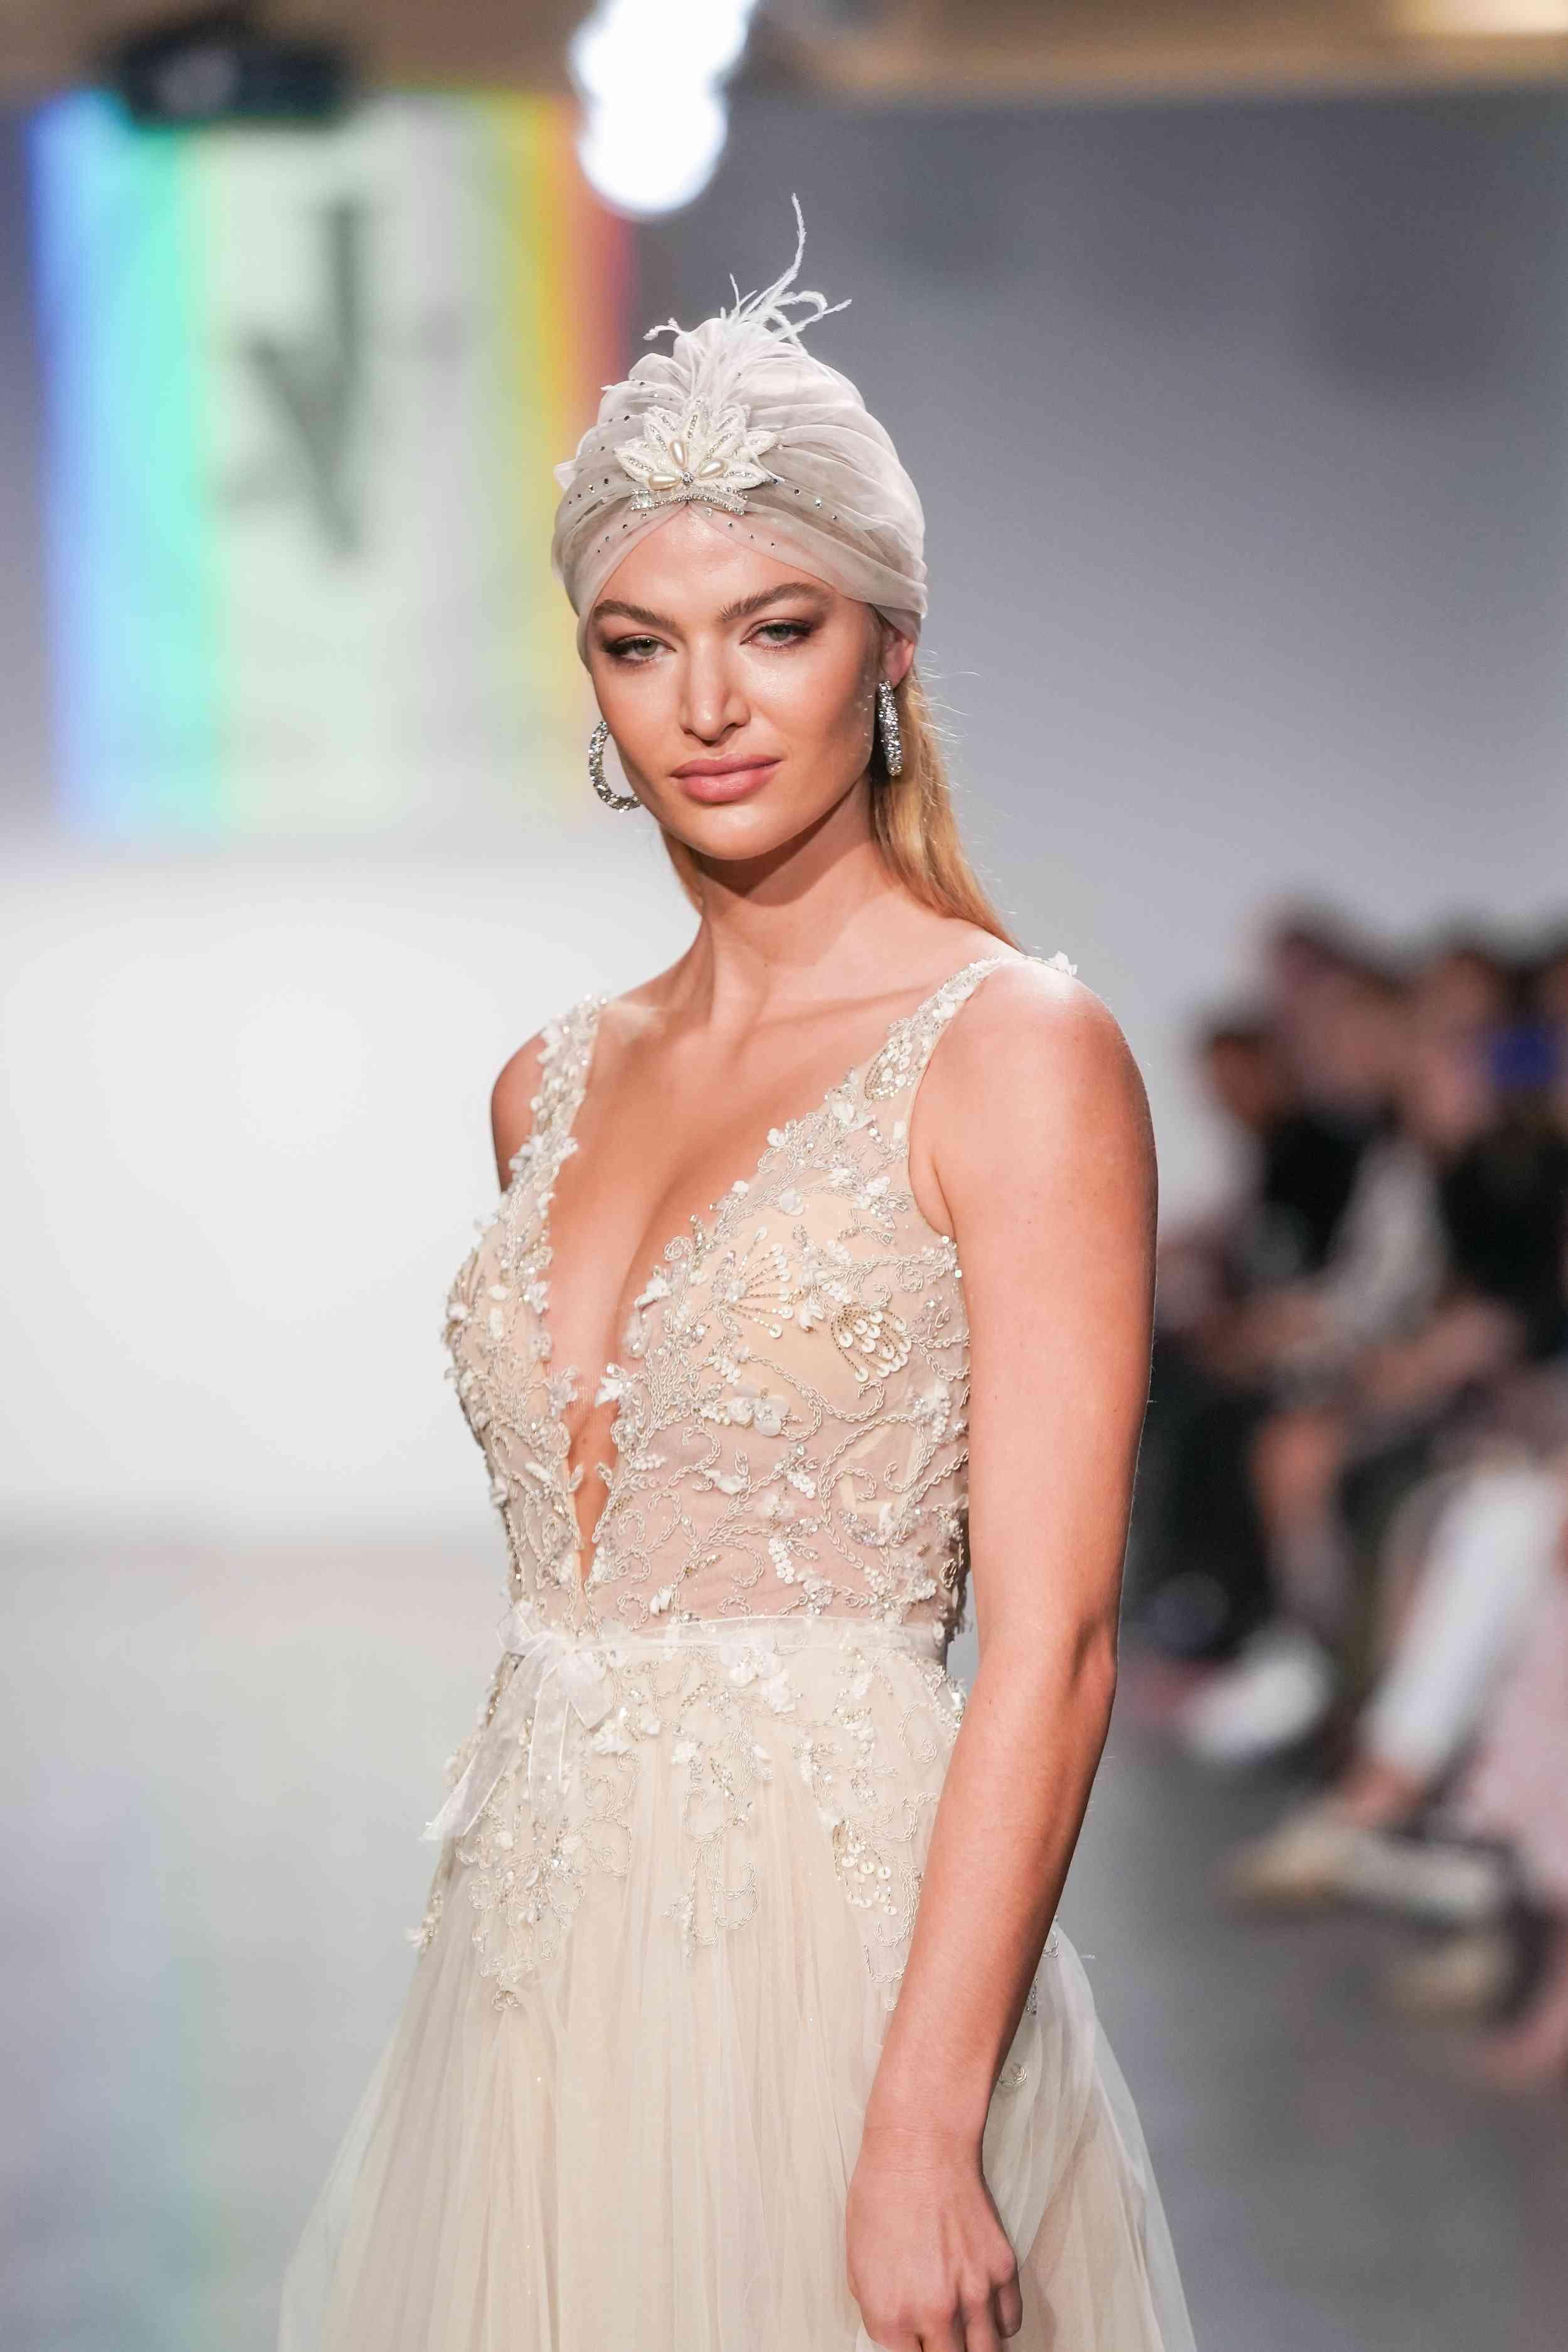 Model in sleeveless A-line wedding dress